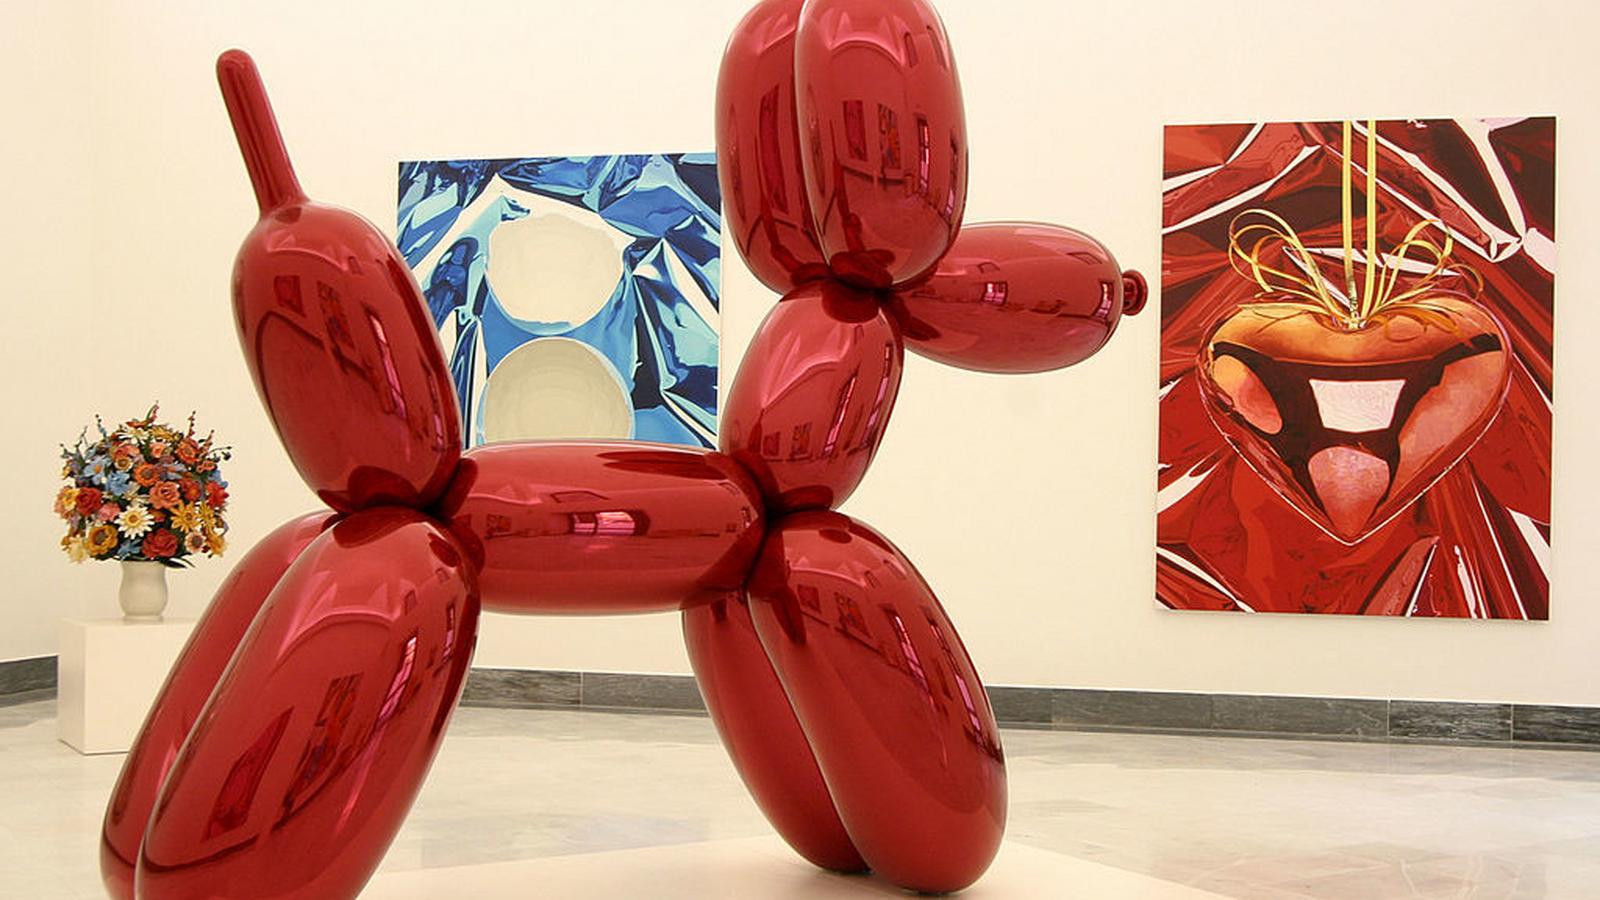 Napompowana sztuka Jeffa Koonsa